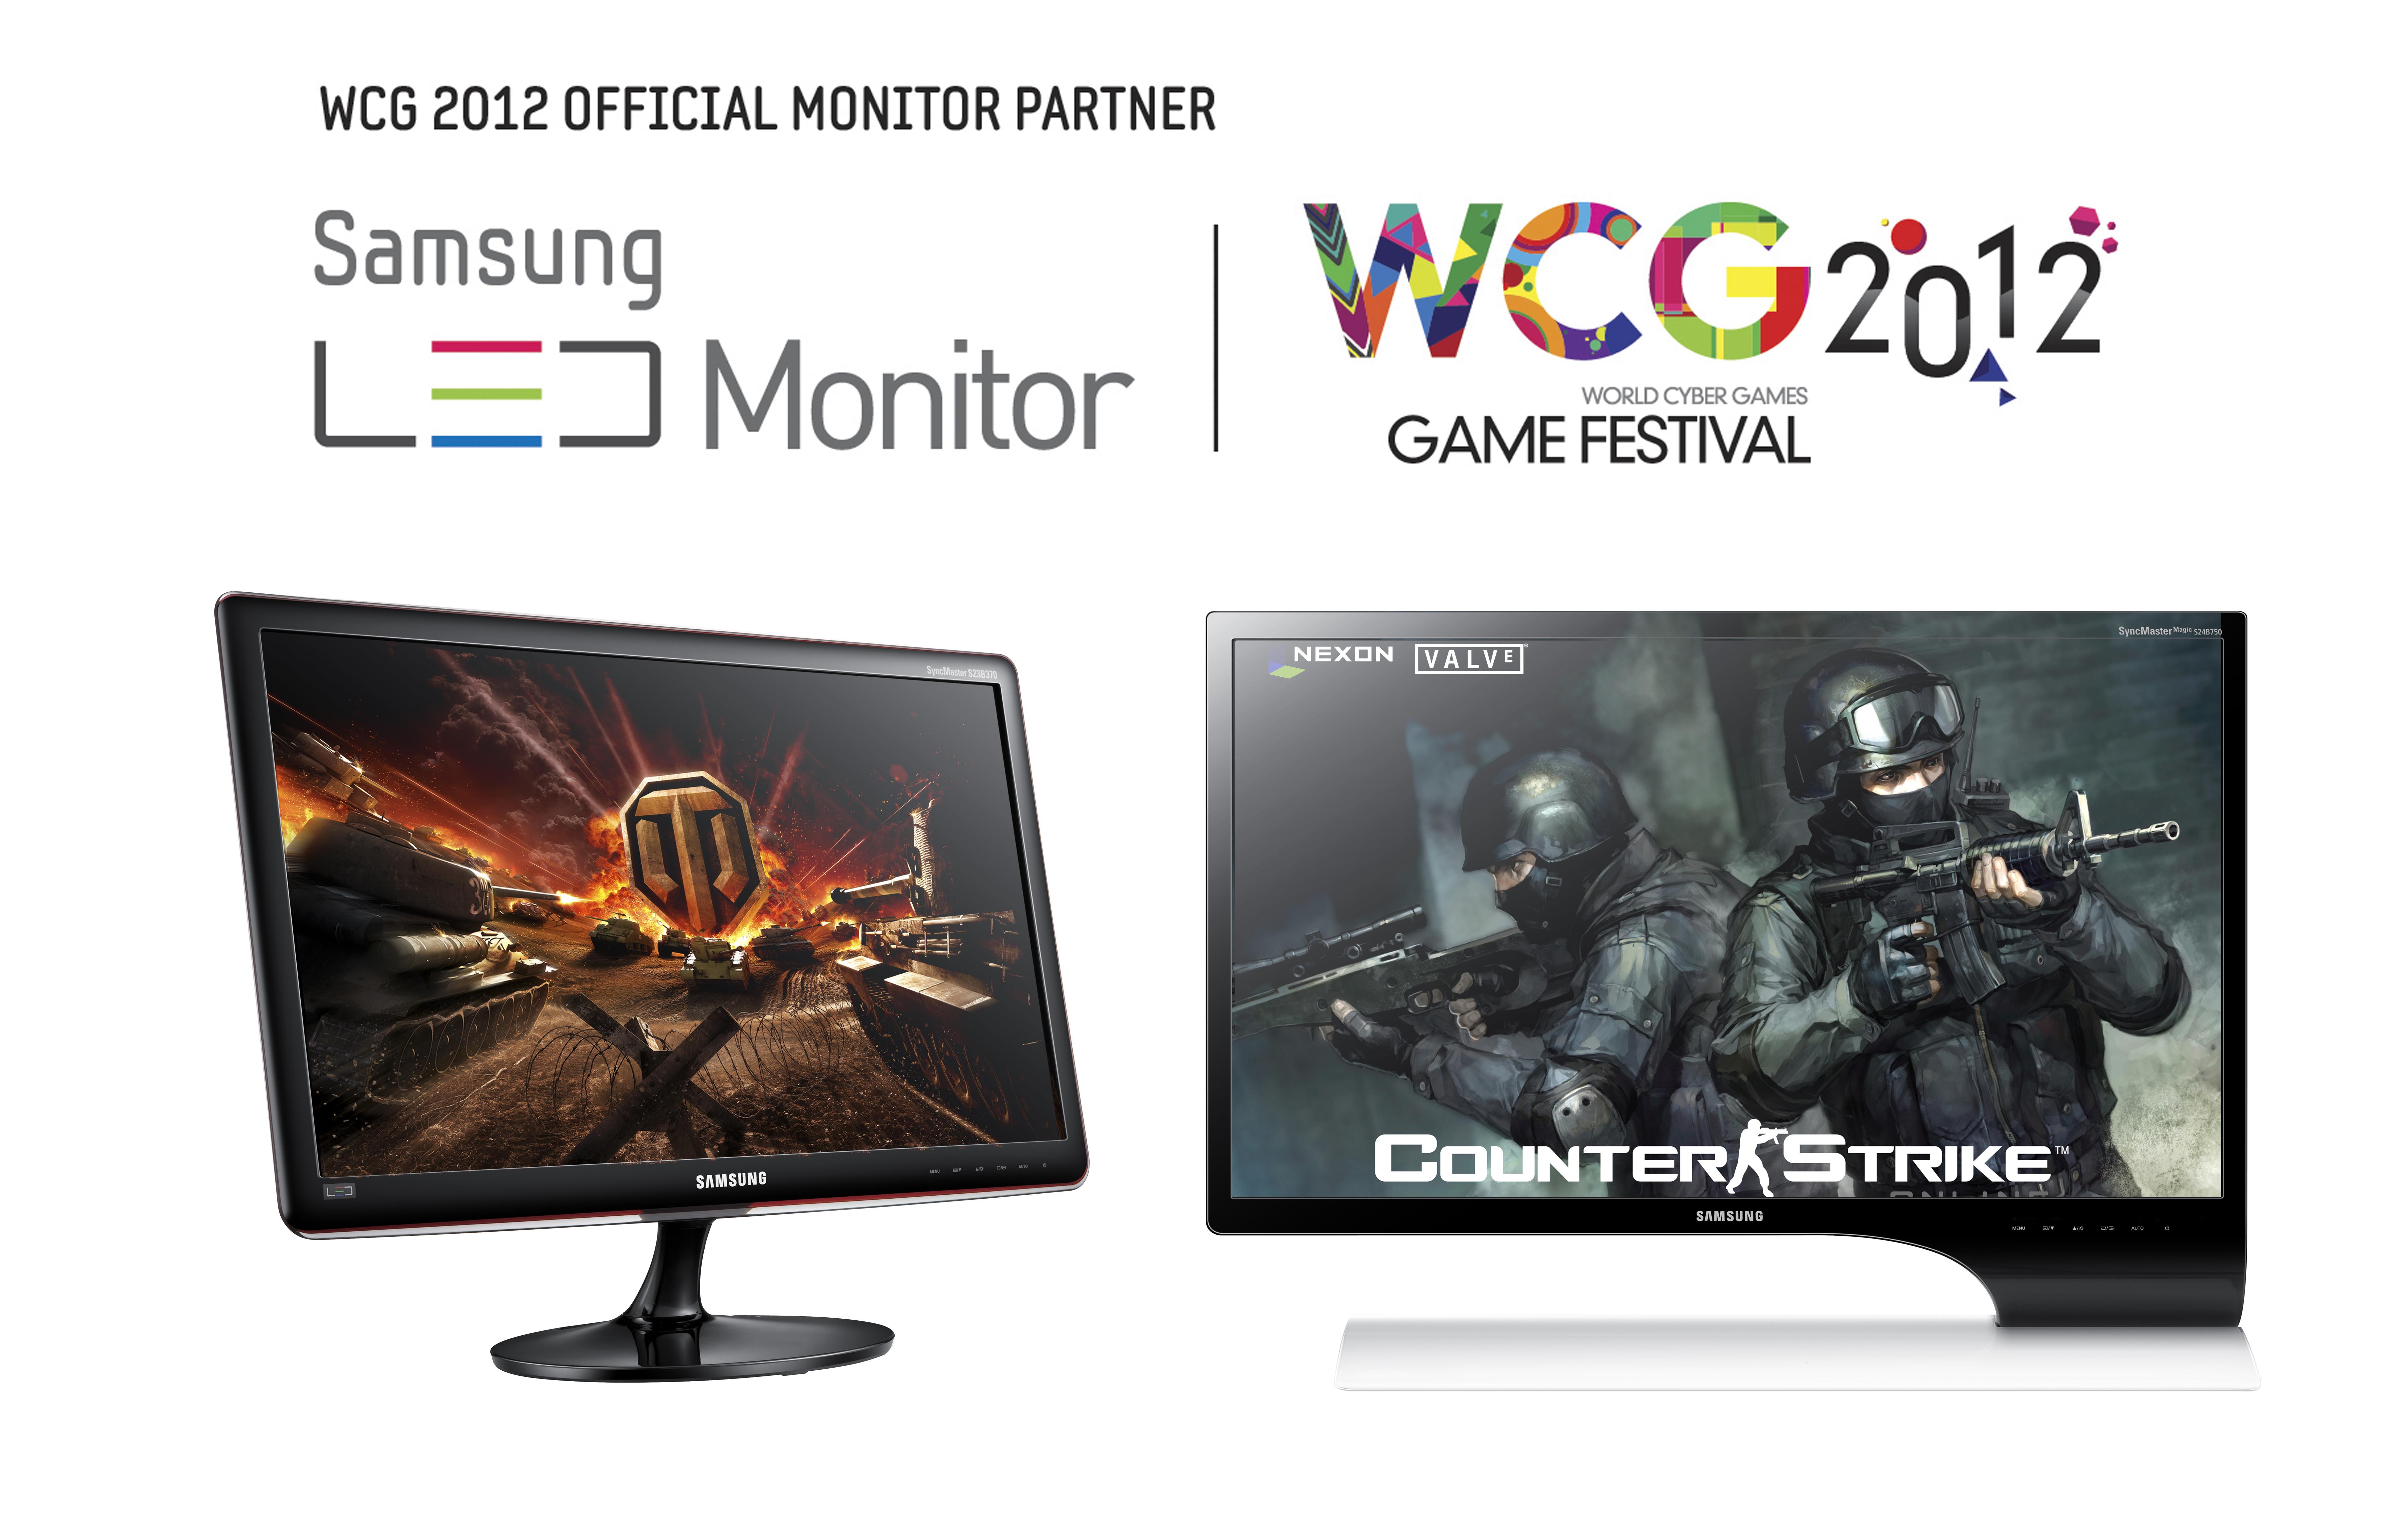 WCG2012 공식 파트너로 선정된 삼성전자 모니터